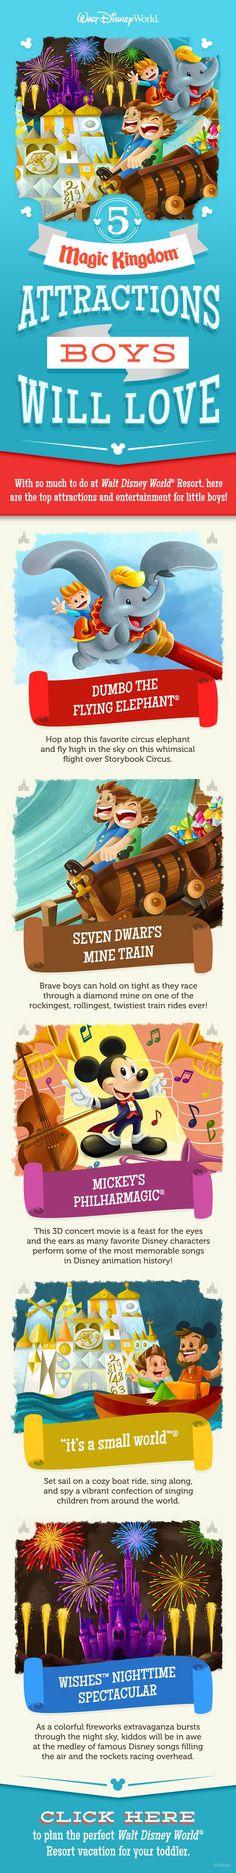 5 Magic Kingdom Attractions Boys will Love at Walt Disney World! #Vacation #Disney #travel www.thepixieplanner.com